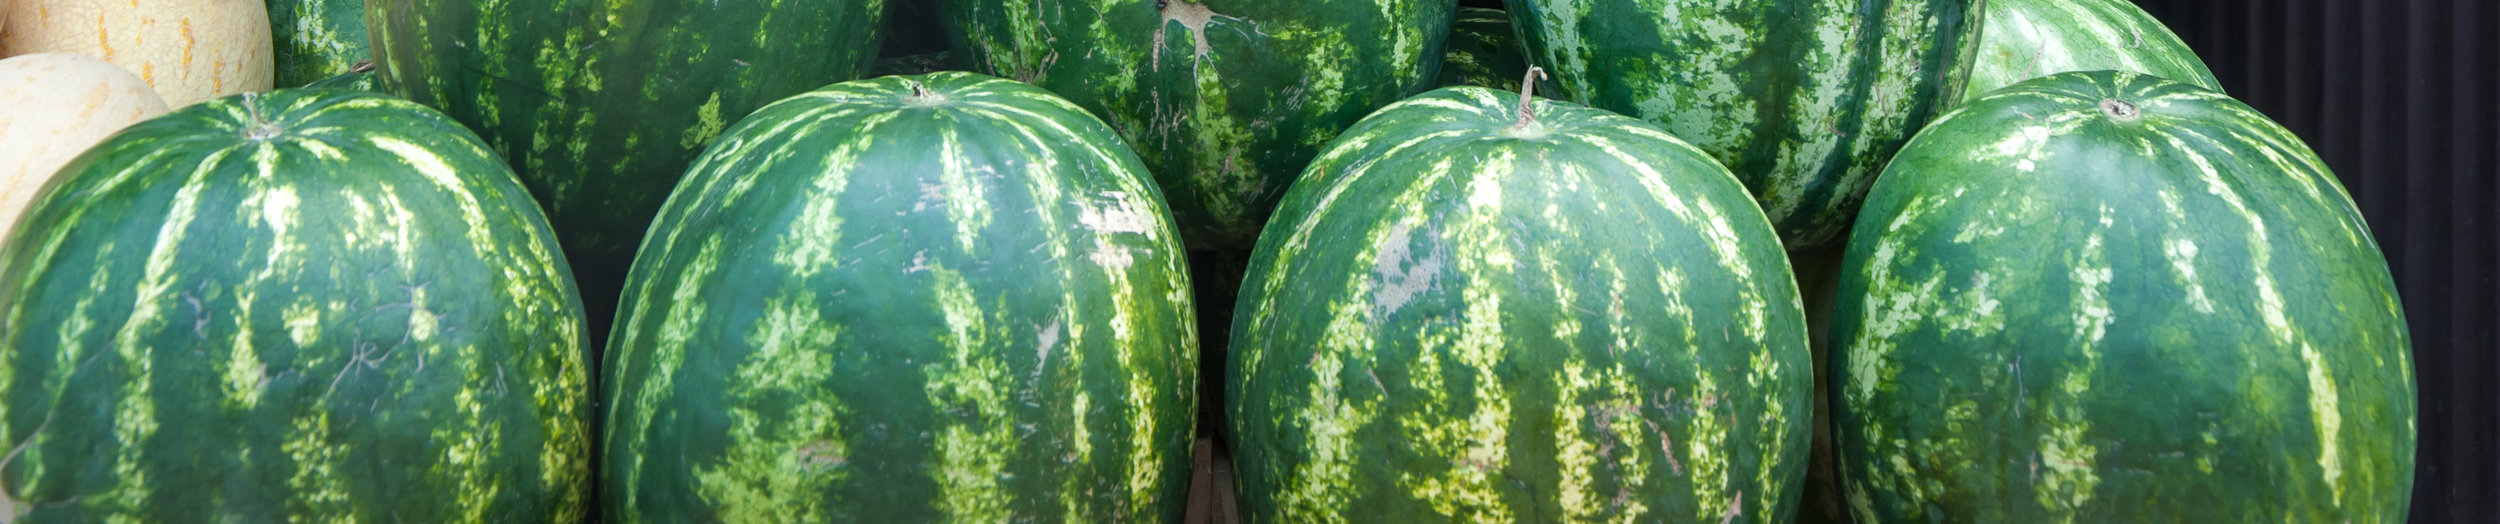 melonproduce_banner.jpg